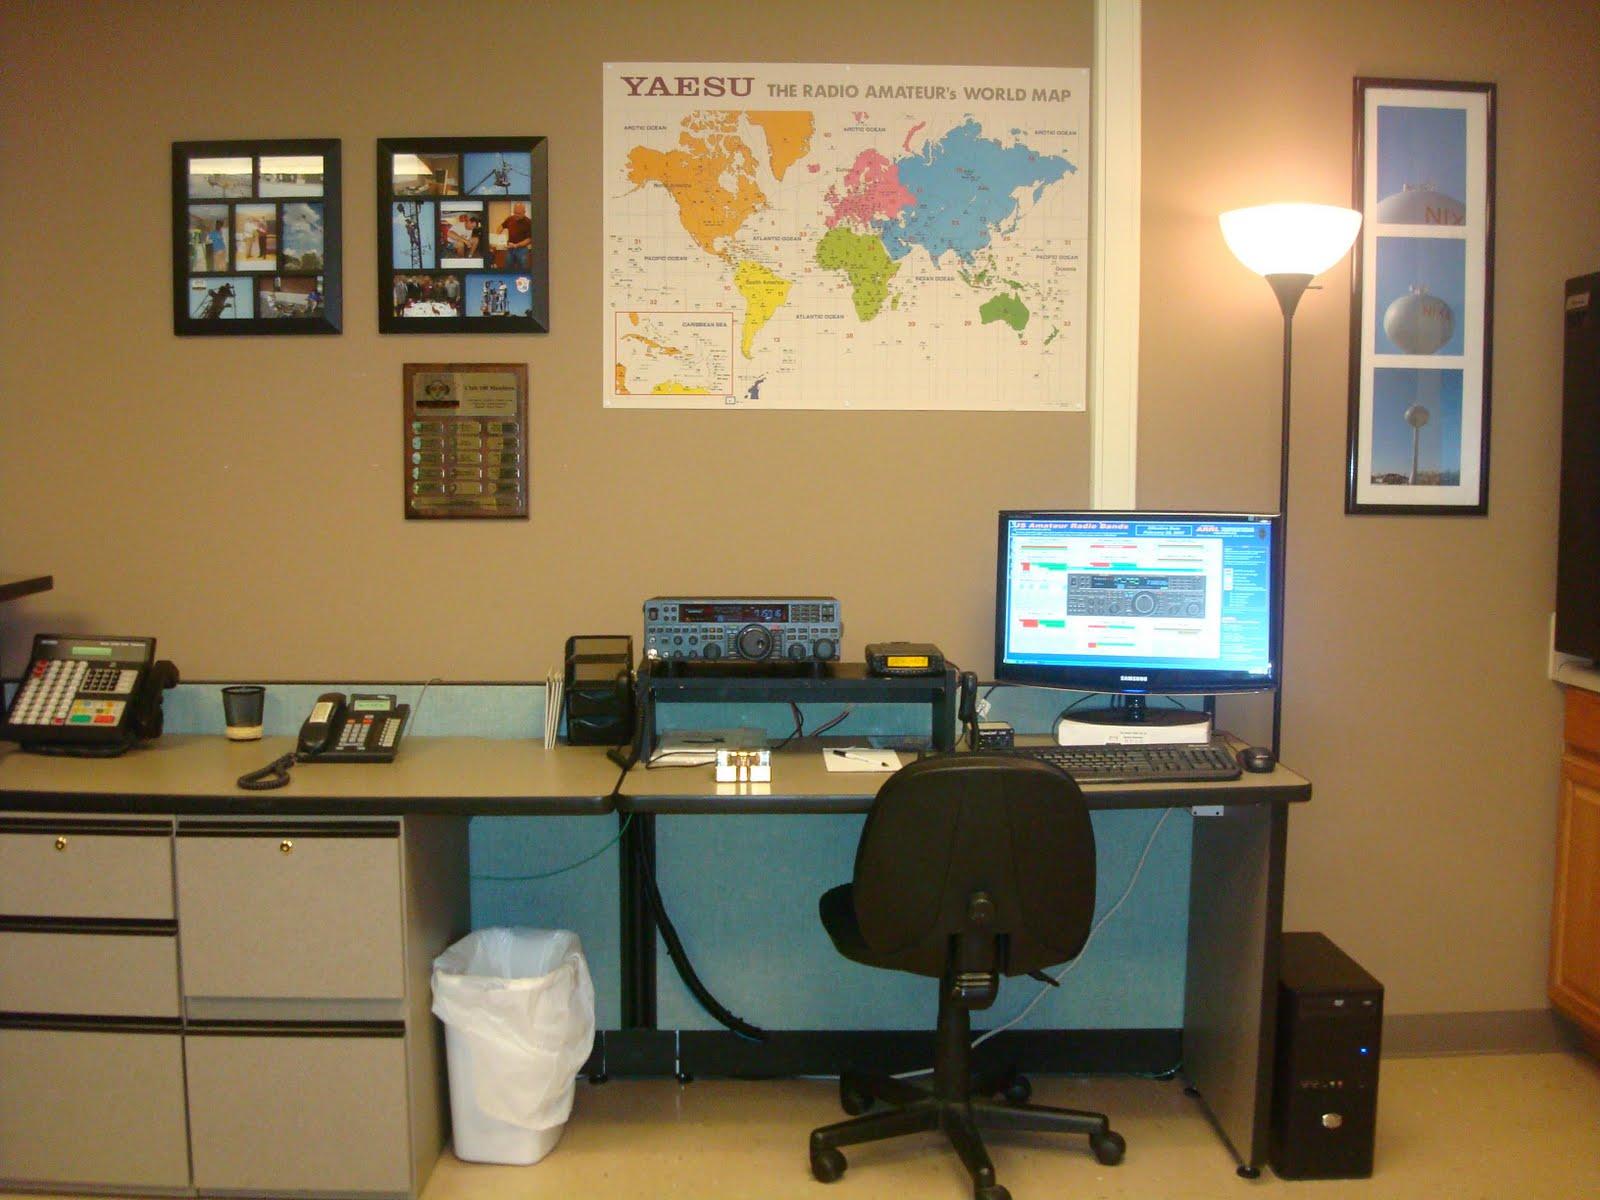 of the Nixa Amateur Radio